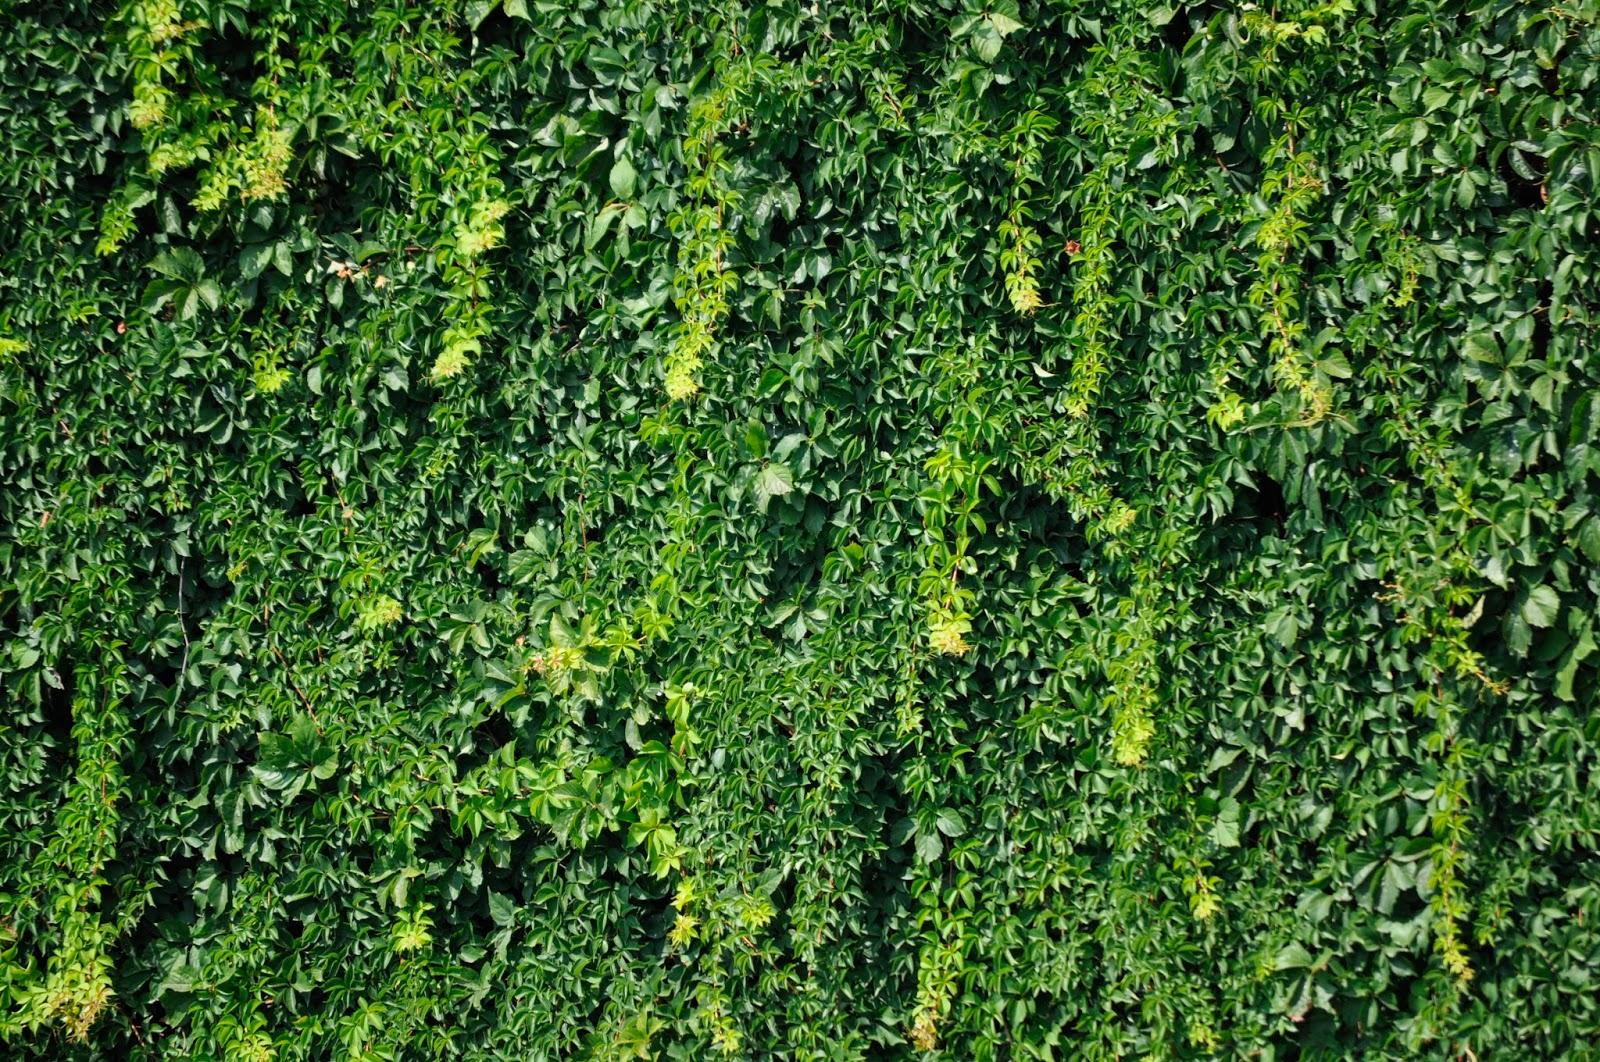 Diz-i Photos: Texture verdure